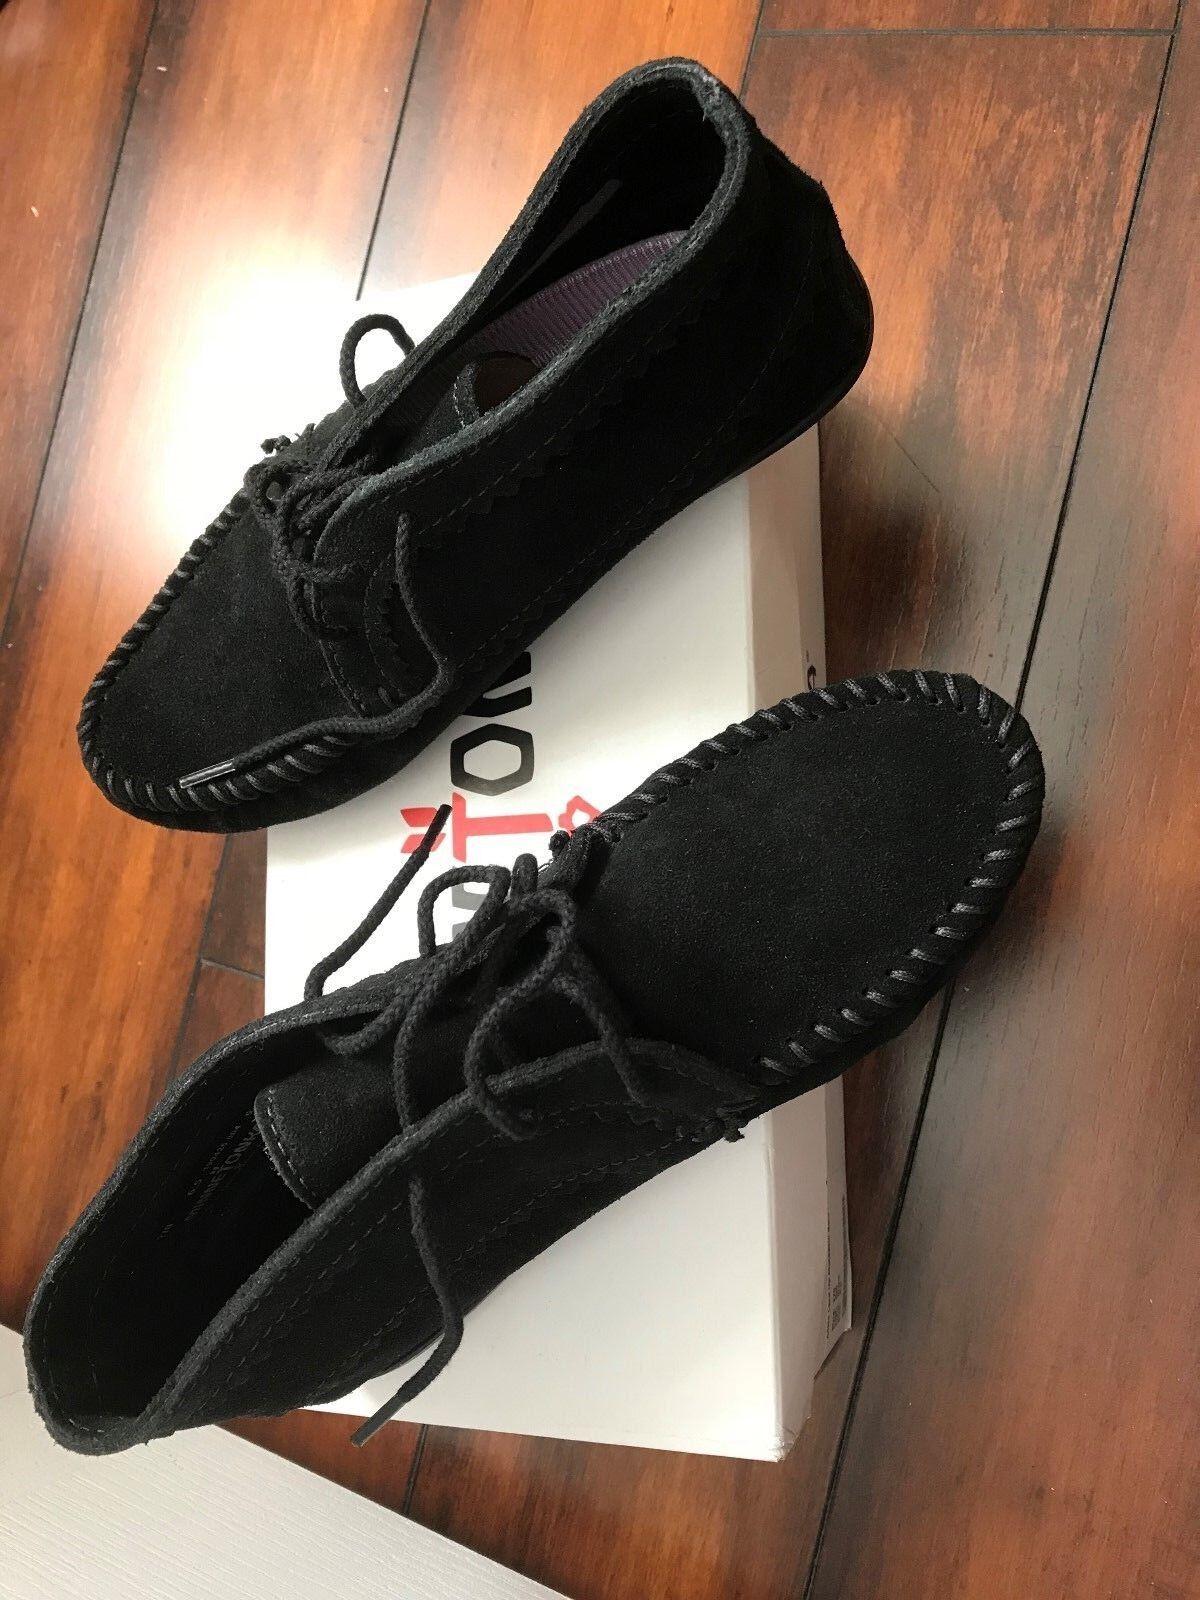 Nuevo En Caja Negro Gamuza Tobillo botas Minnetonka para mujeres mujeres mujeres zapatos talla 6.5  gran venta